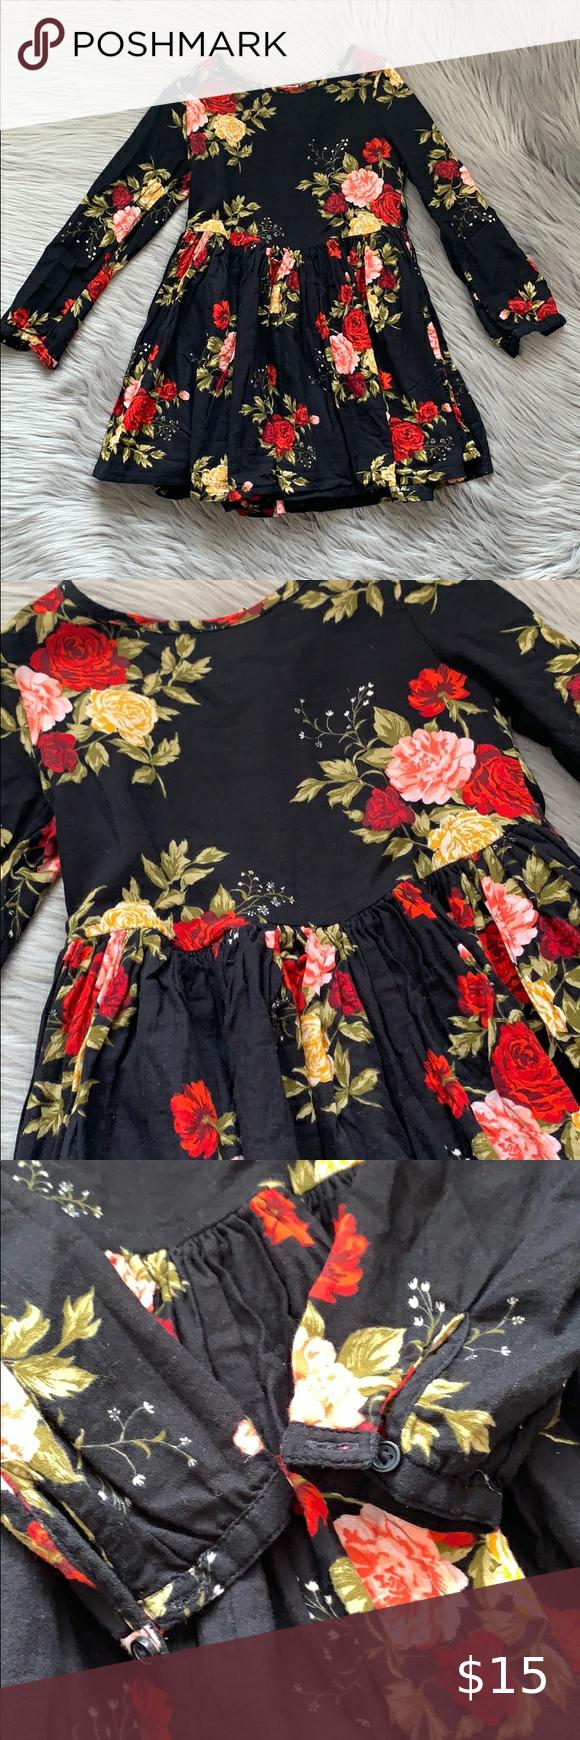 Old Navy Floral Dress Girls 5t Navy Floral Dress Clothes Design Girls Dresses [ 1740 x 580 Pixel ]